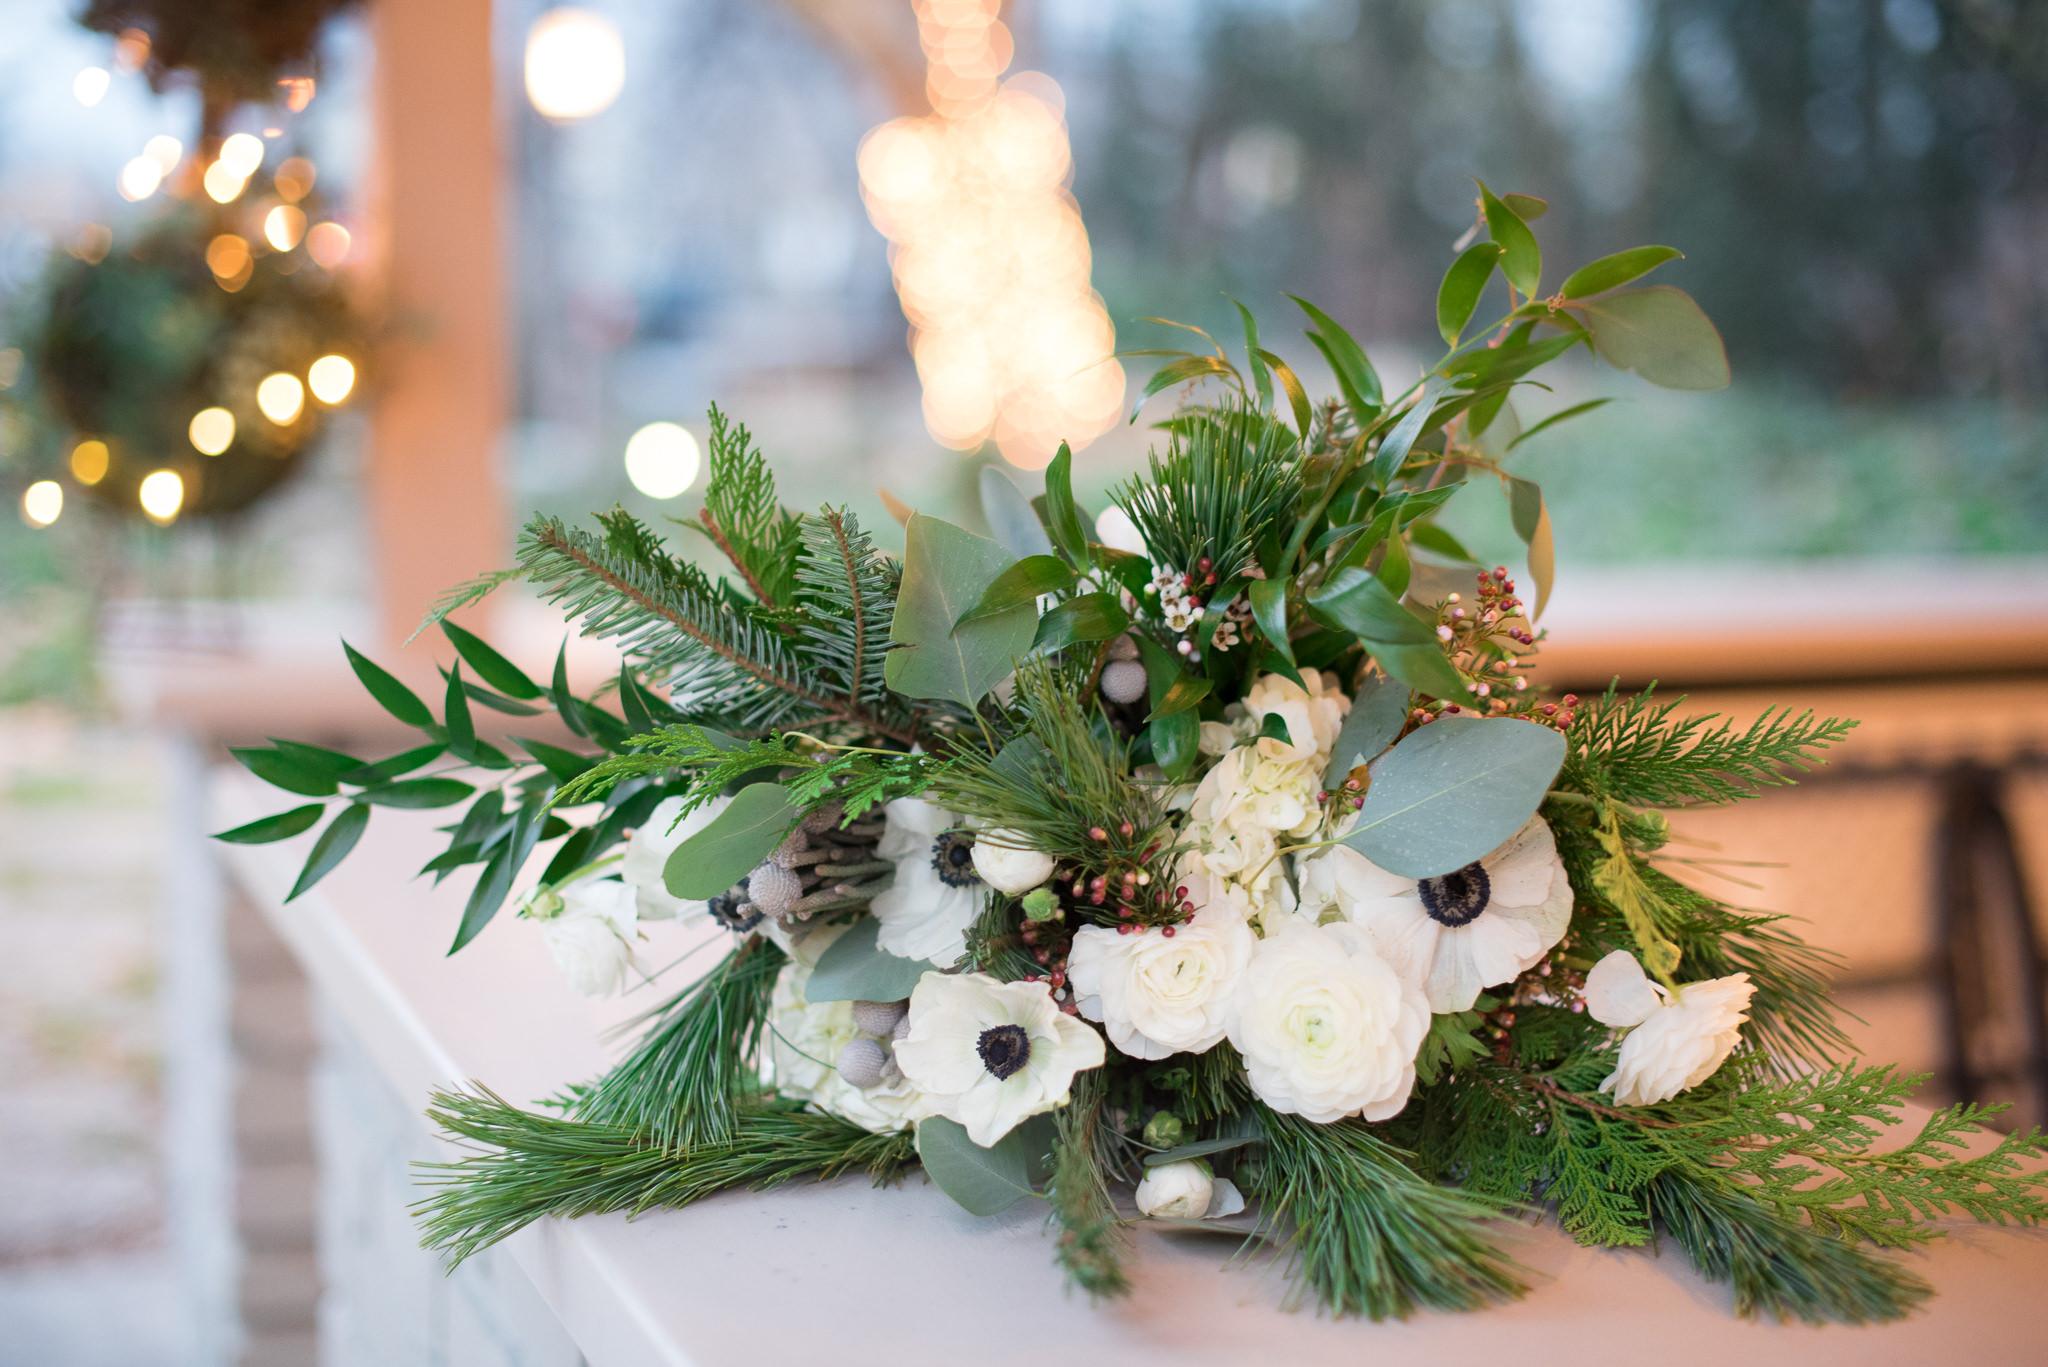 Trevor-Hooper-Wedding-Photographer-The-Bungalow-Wedding-Utah_CLR_049.jpg